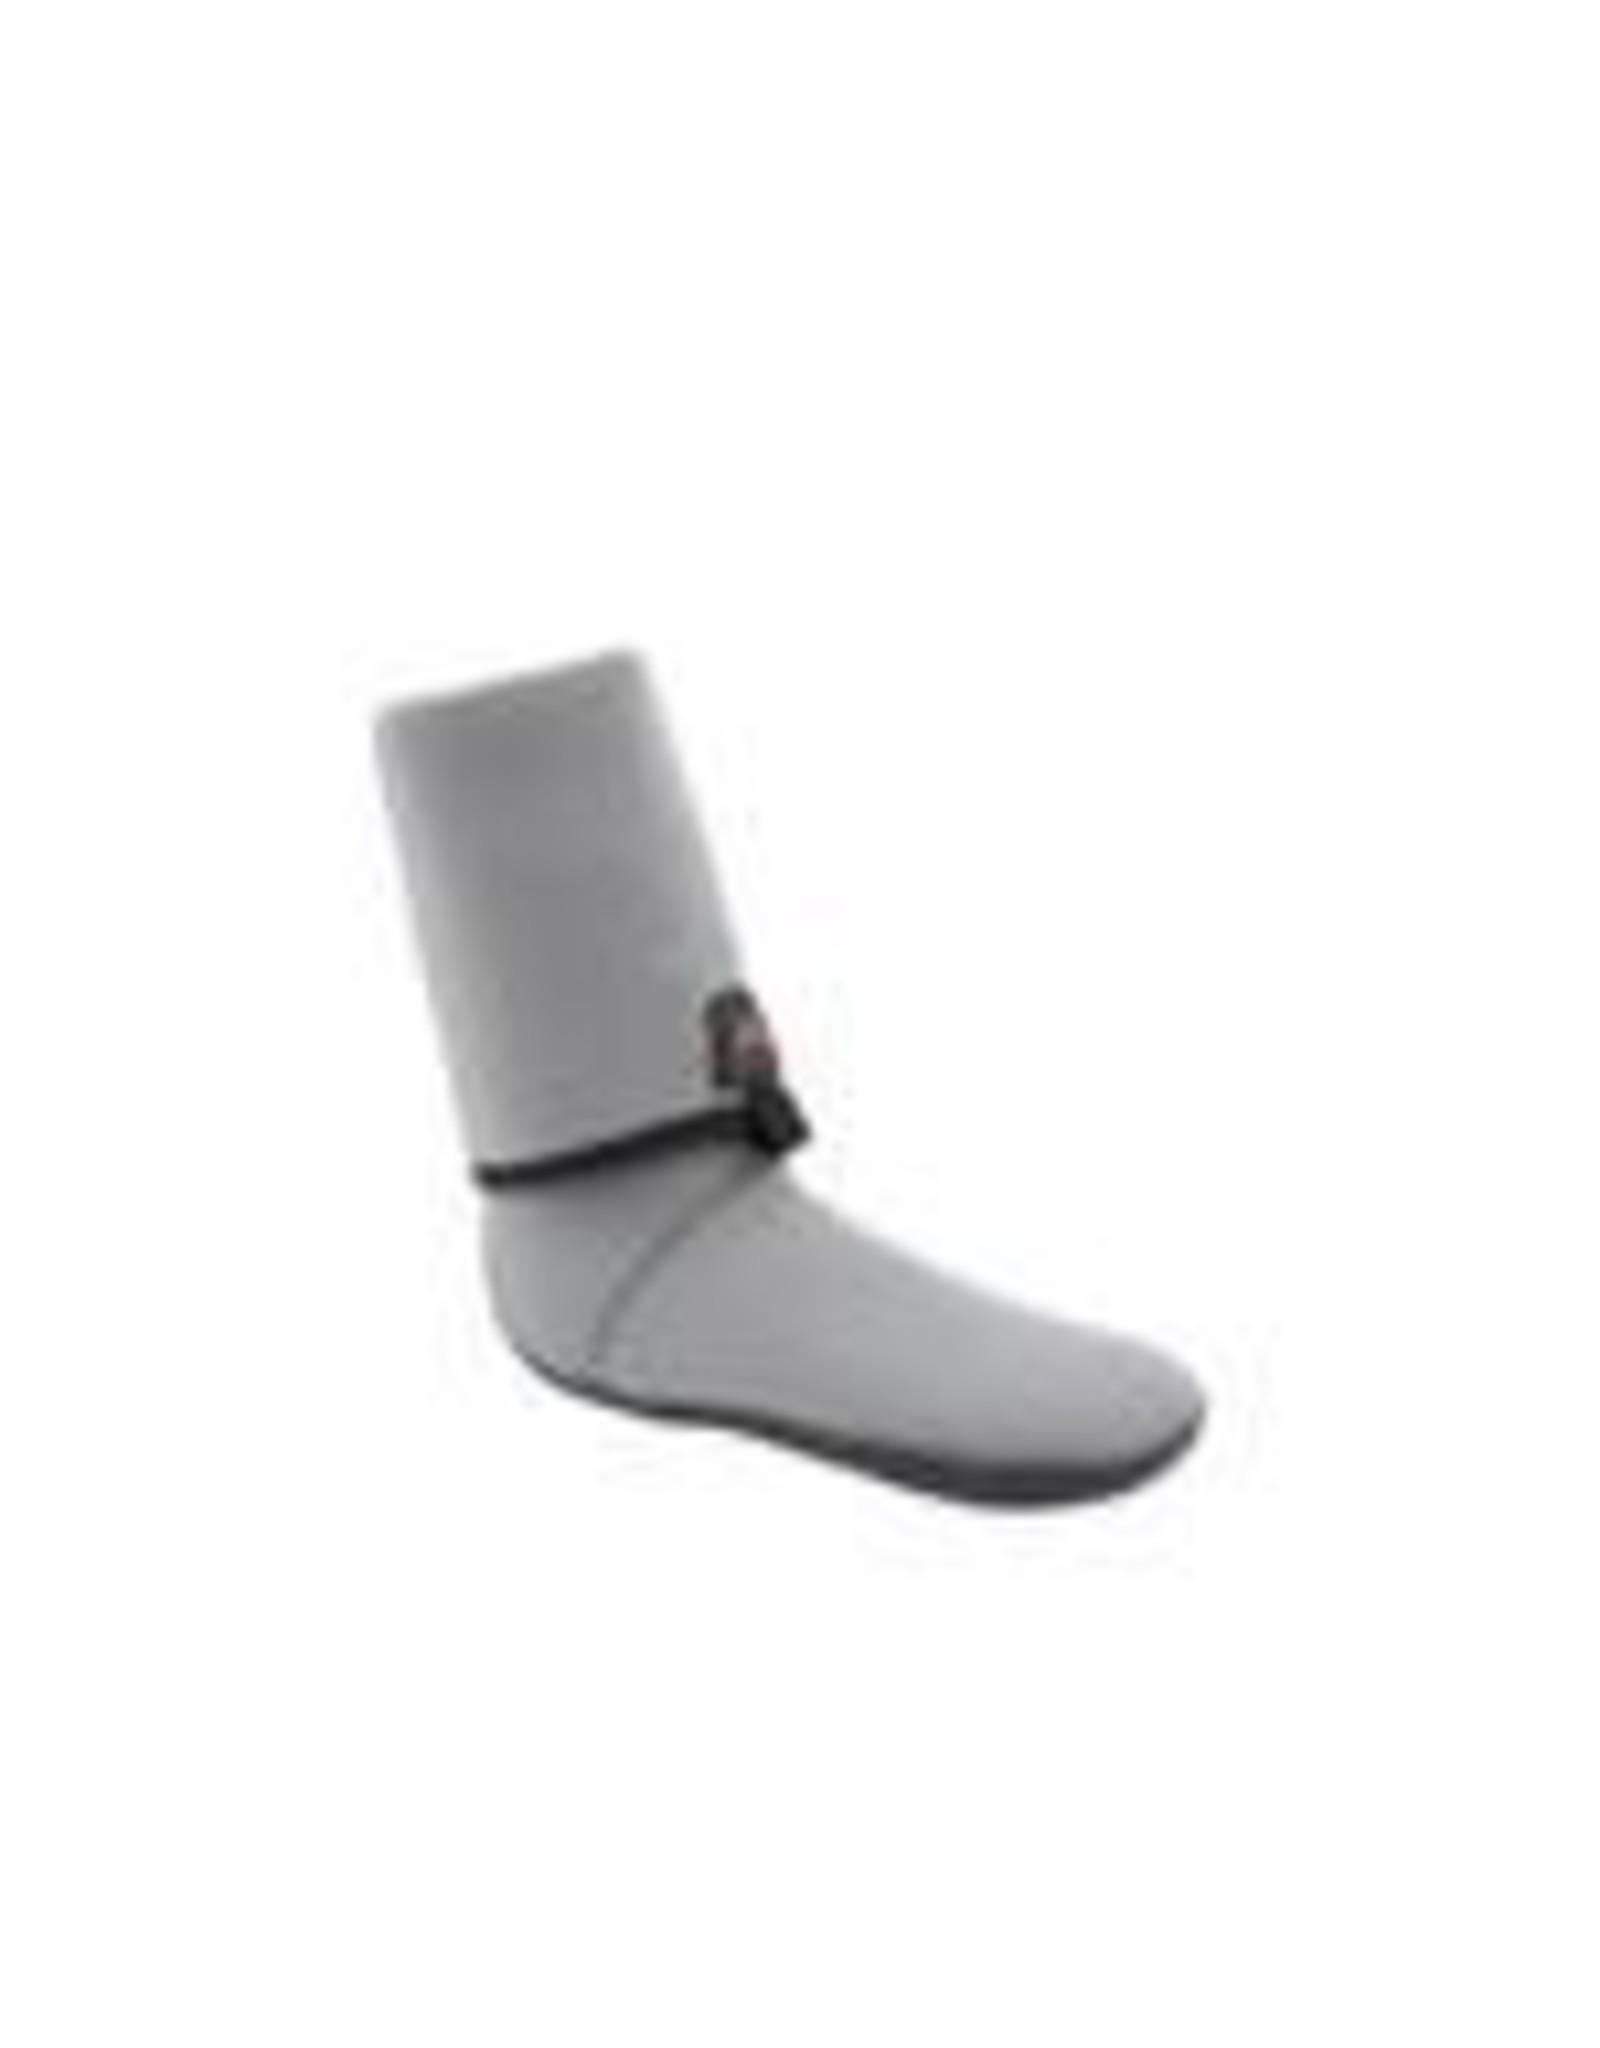 Simms Guide Guard Socks - Pewter - Large